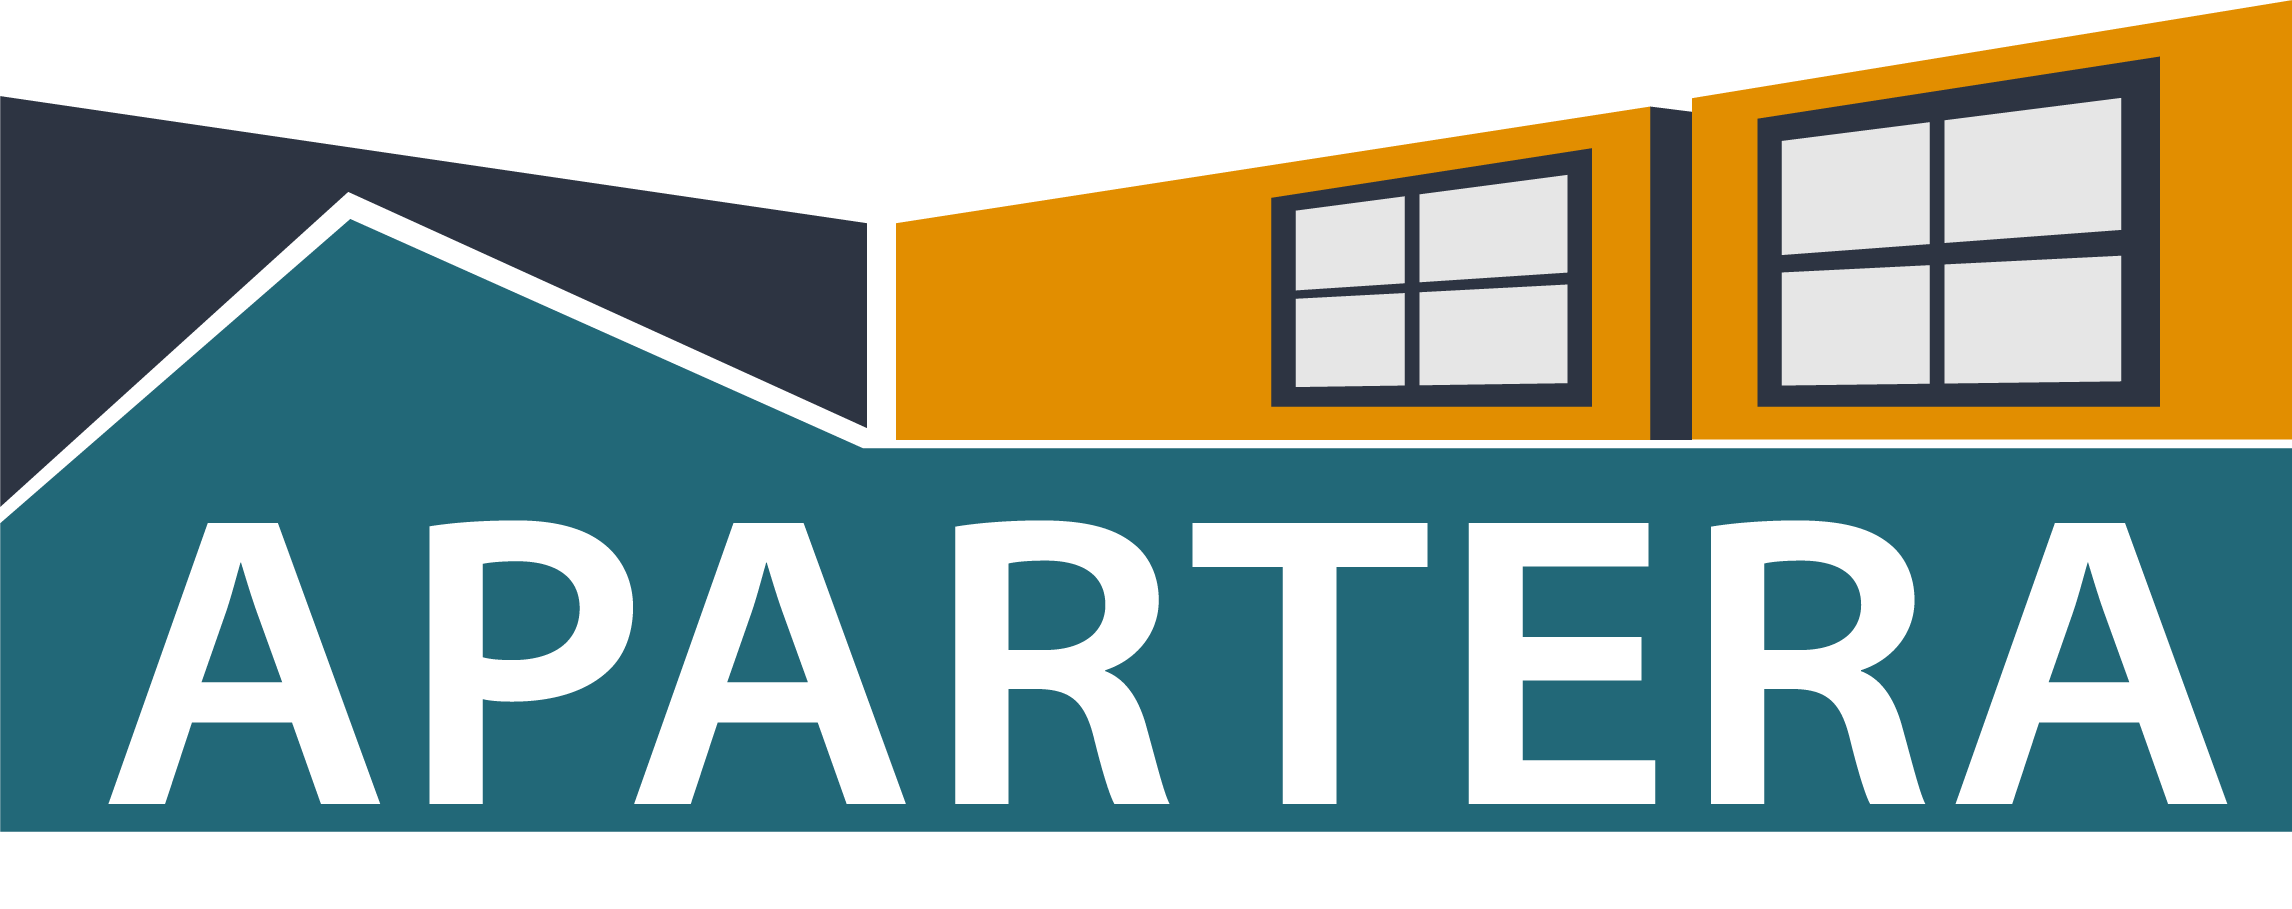 Логотип для управляющей компании  фото f_5195b6dfa7a57056.png